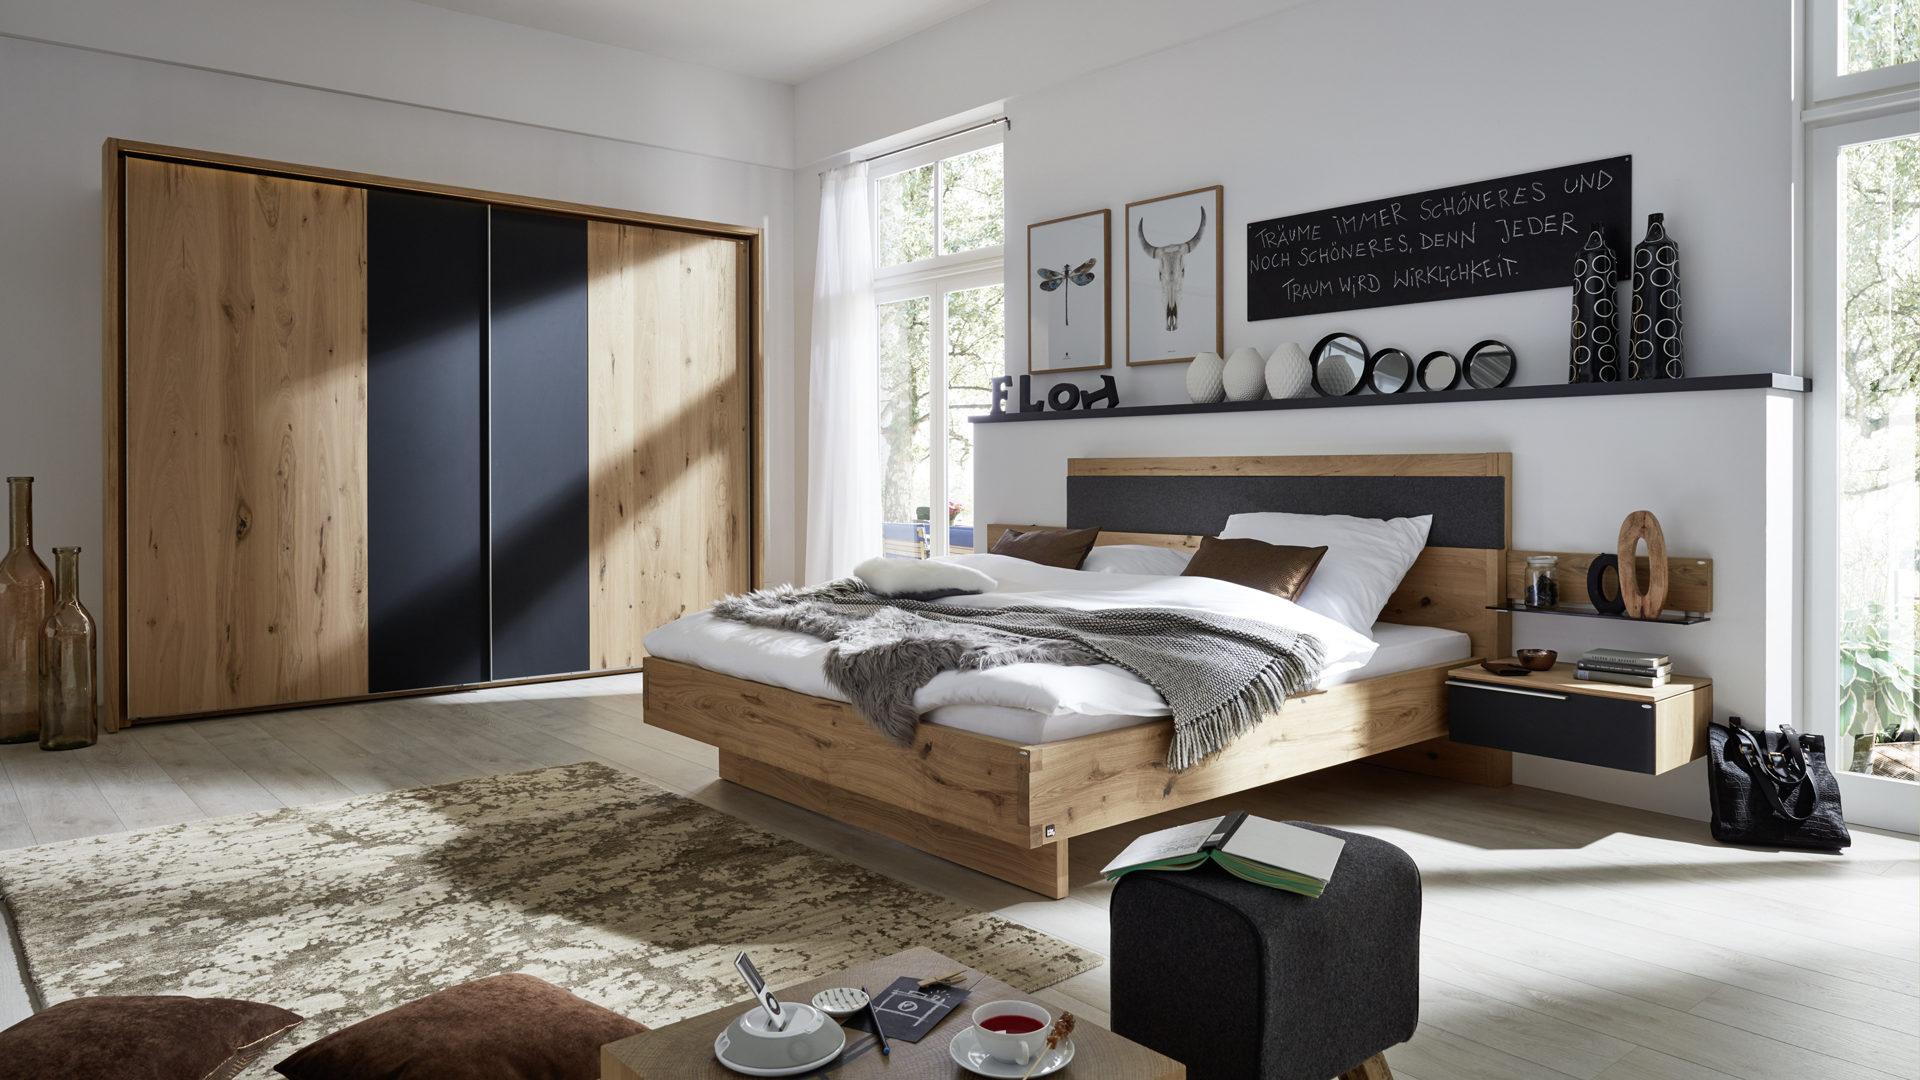 Möbel Frauendorfer Amberg | HIGHLIGHT | Interliving Schlafzimmer ...